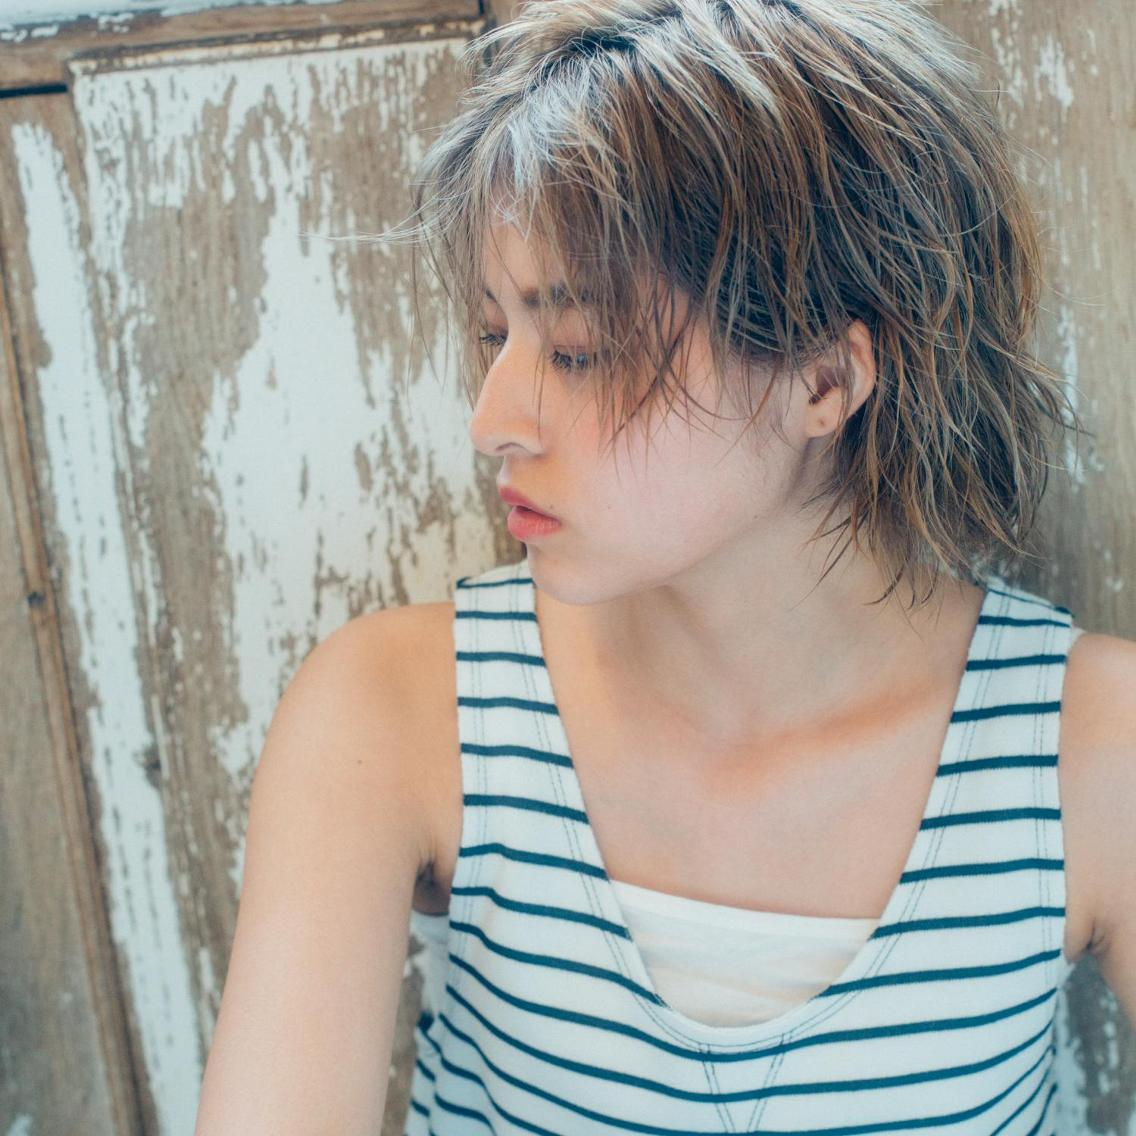 ROSSO Hair&SPA 獨協大学前店所属・ROSSO獨協大学前店の掲載